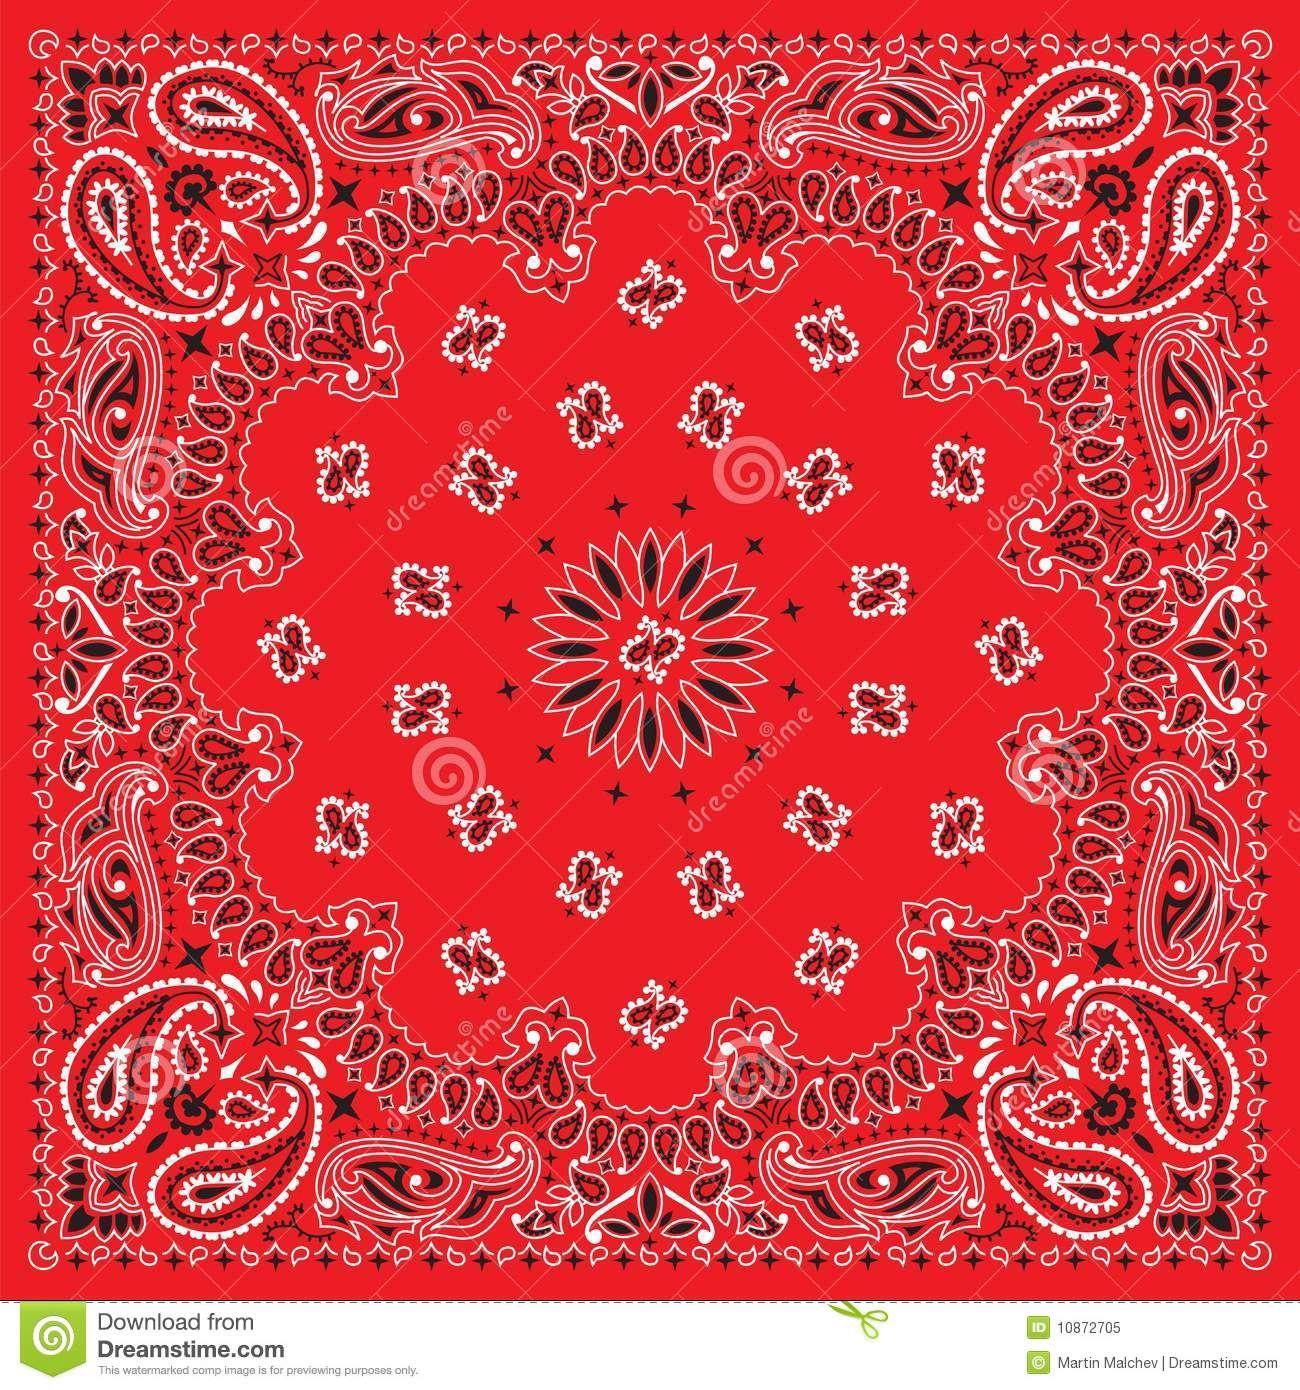 Illustration about colors you. Bandana clipart hankerchief